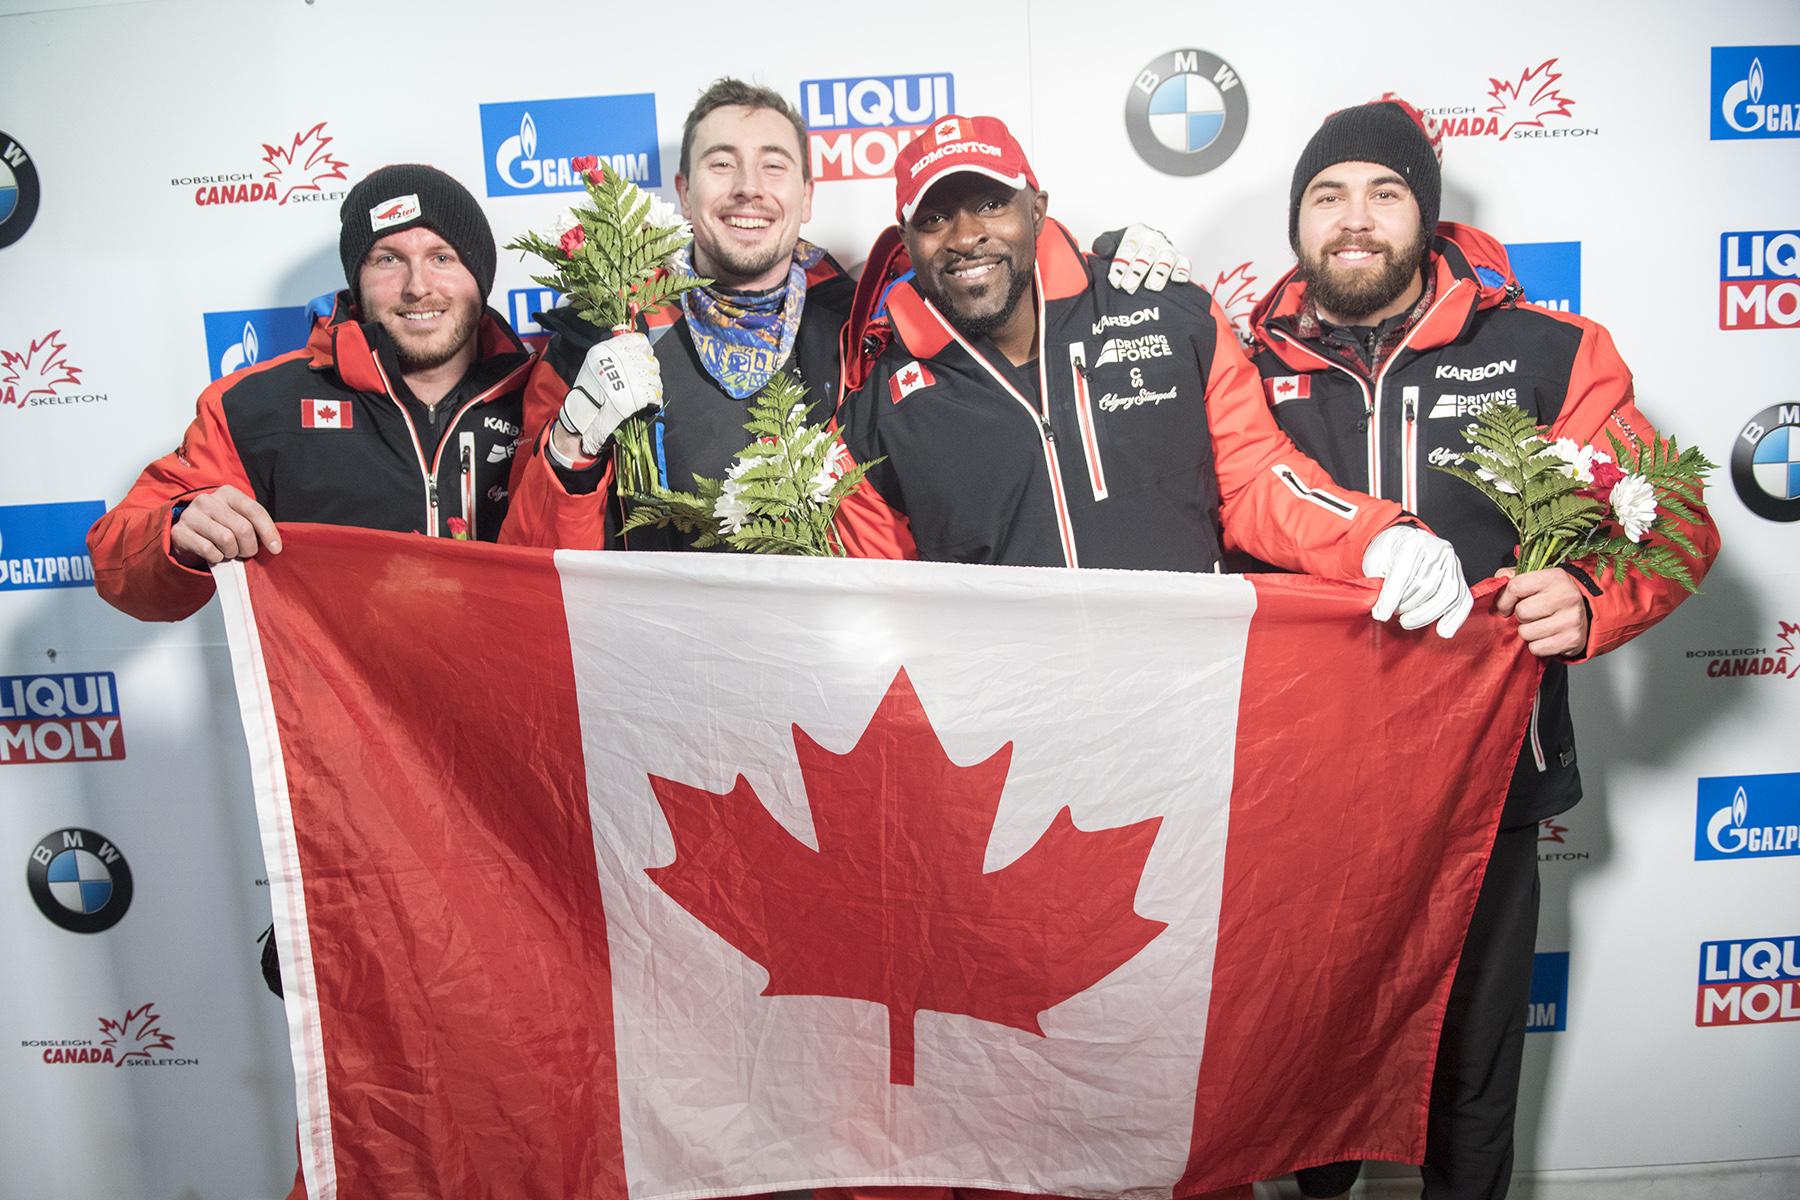 Team Canada - Justin Kripps, Alexander Kopacz, Neville Wright, and Chris Spring celebrate their 1-2 finish